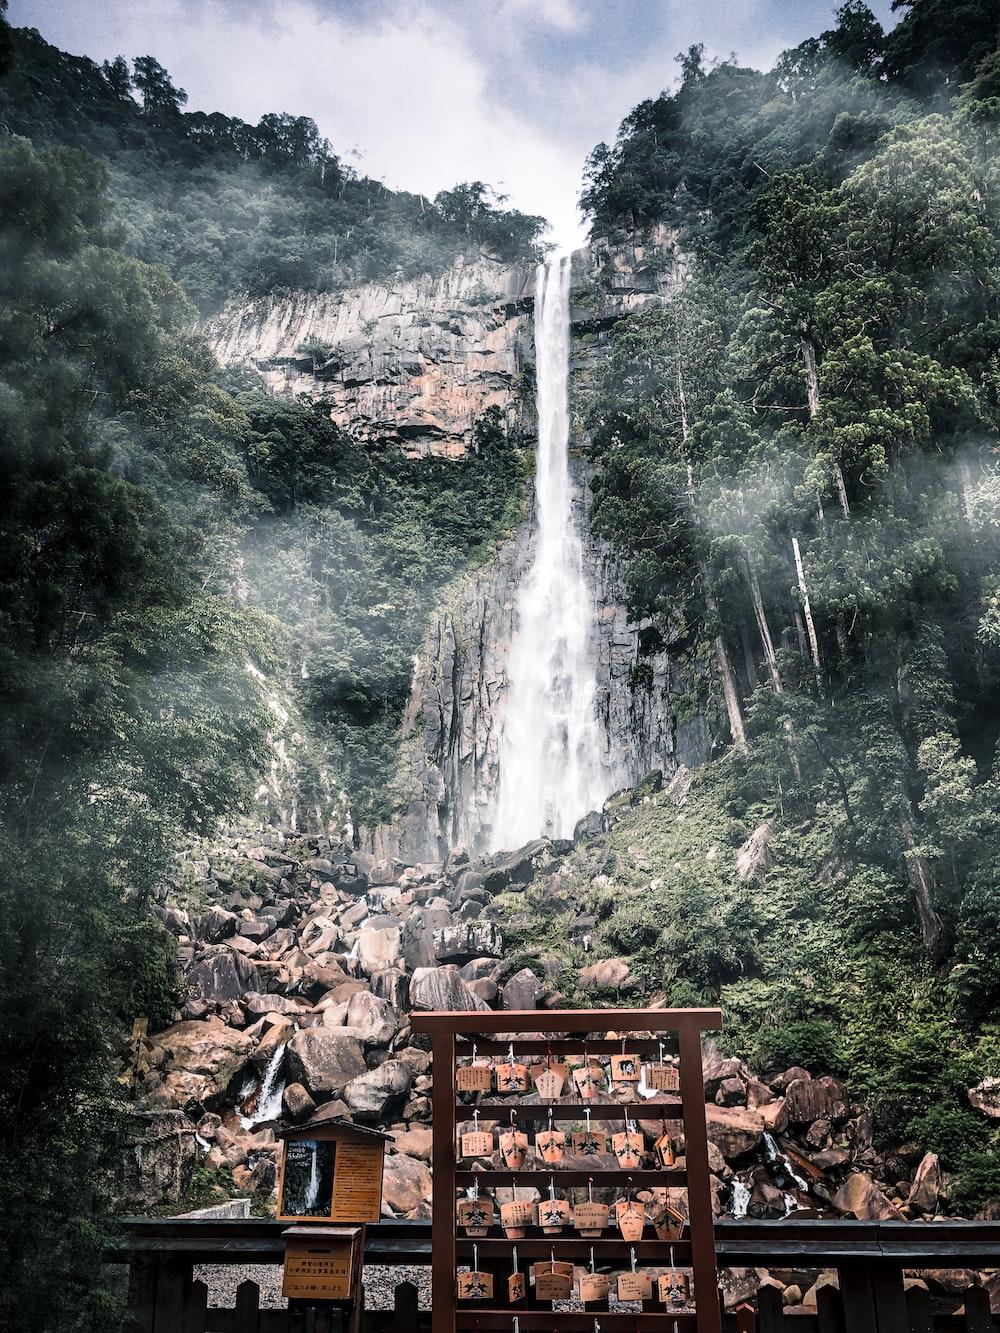 brown wooden bench near waterfalls during daytime